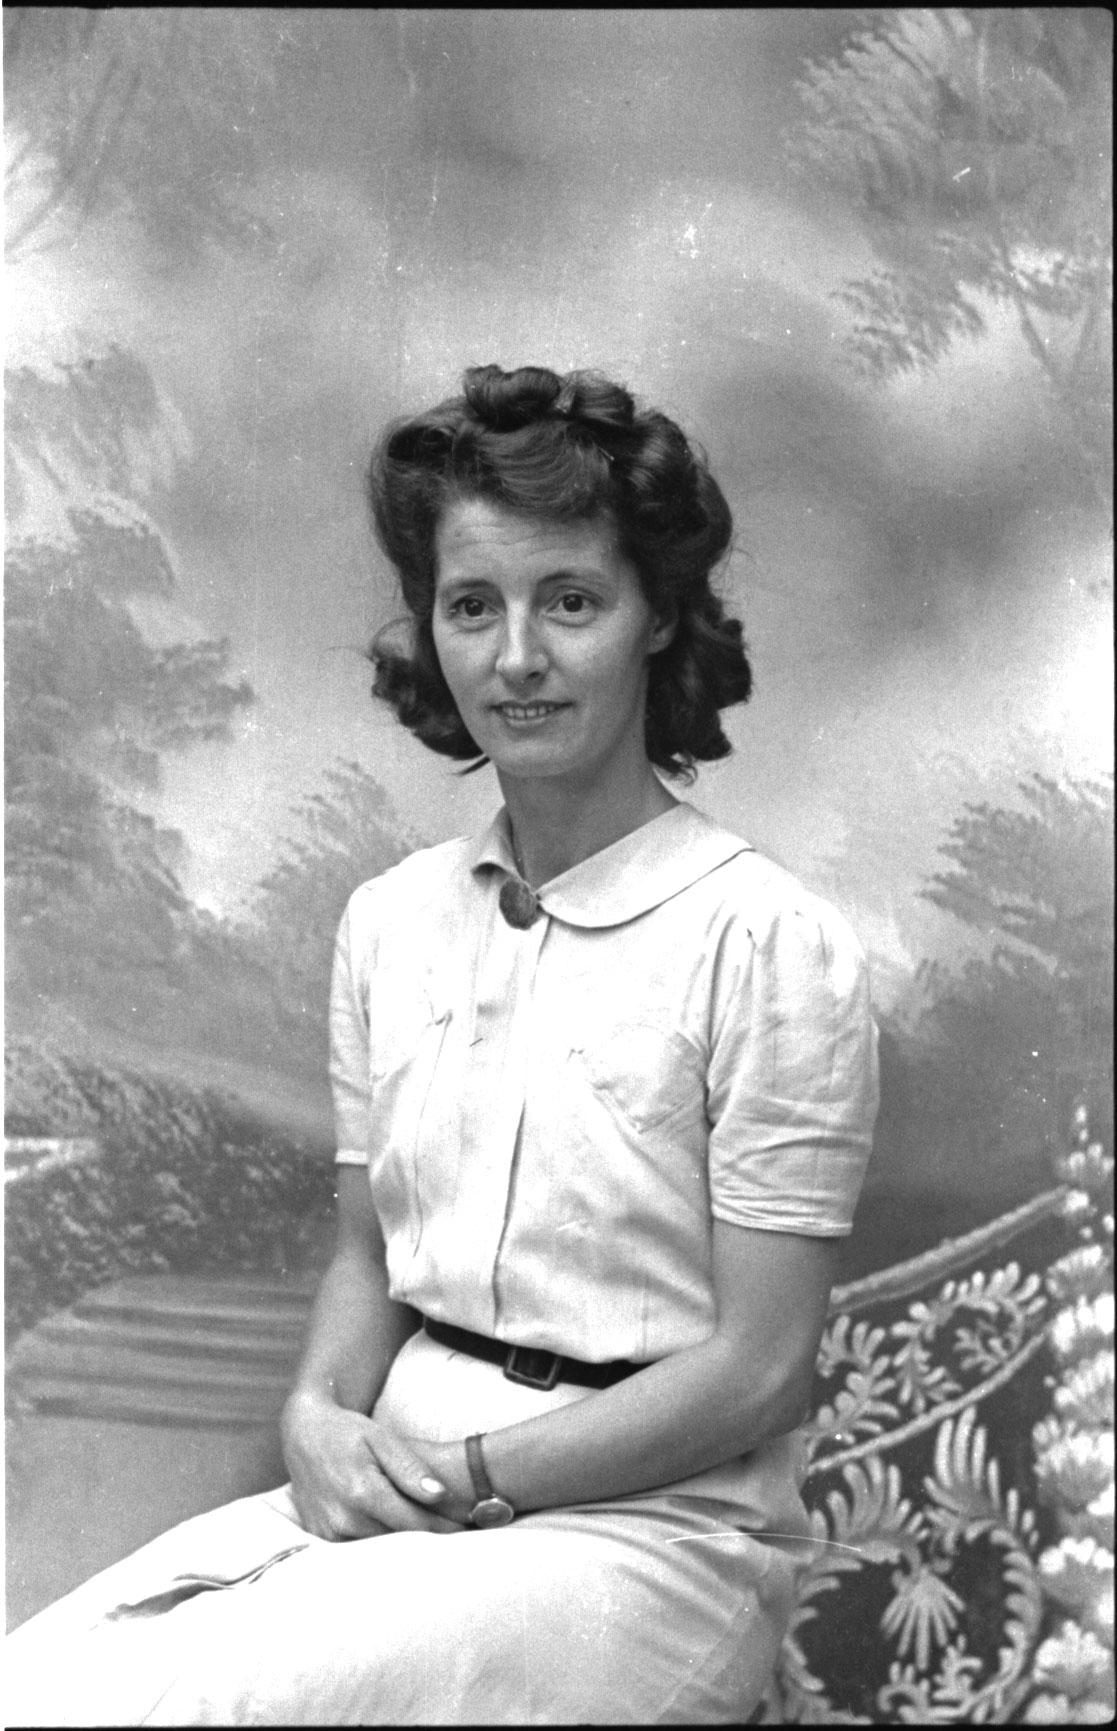 1940s Archives Hair And Makeup Artist Handbook